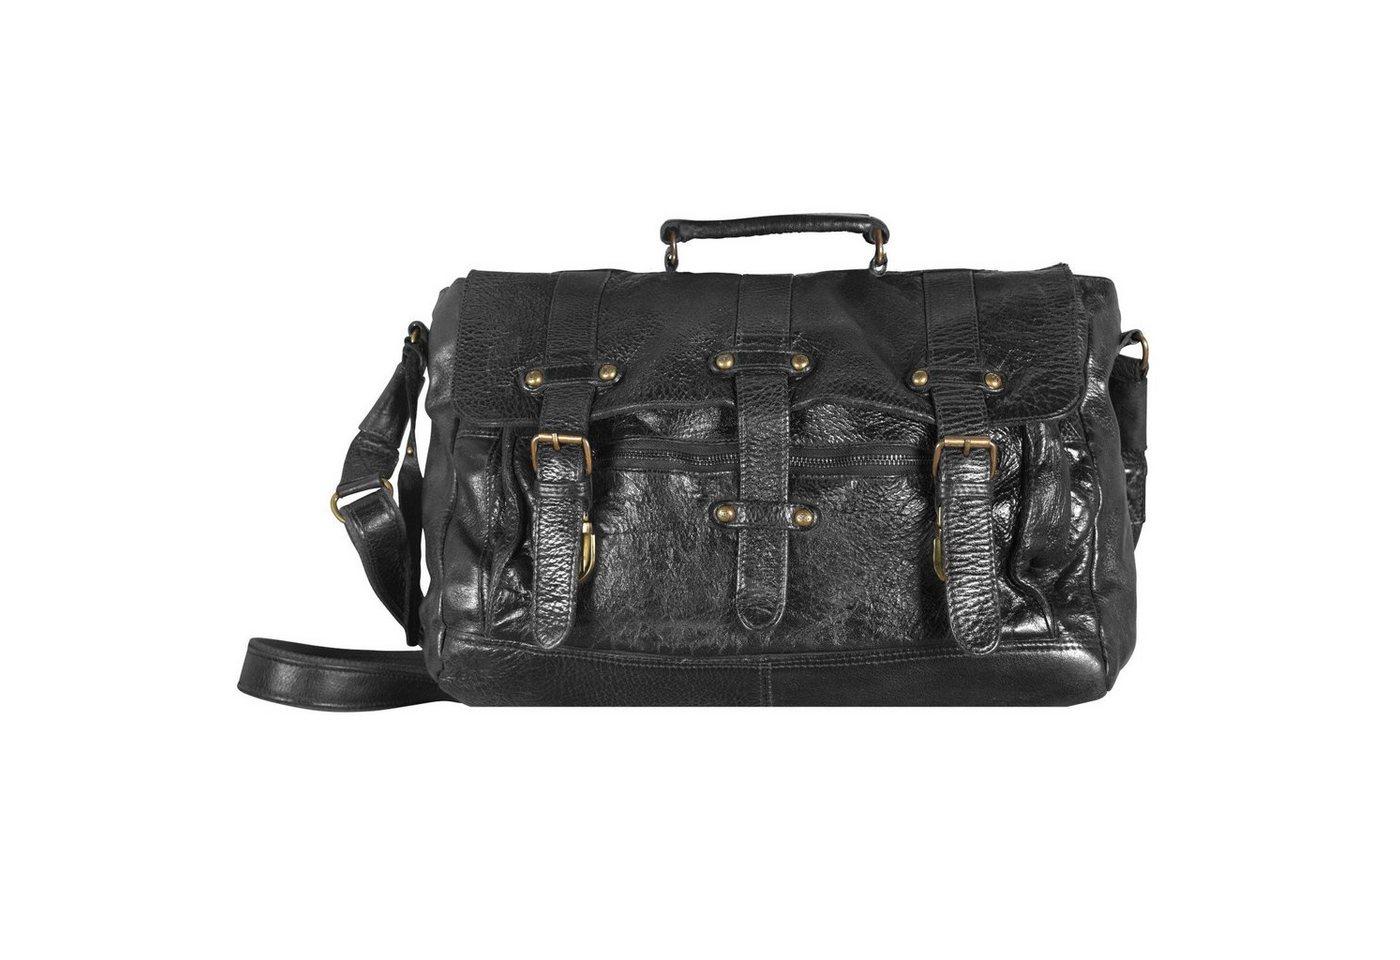 Billy The Kid Daytona Messenger Bag Leder 38 cm | Taschen > Business Taschen > Messenger Bags | Schwarz | Leder | Billy The Kid